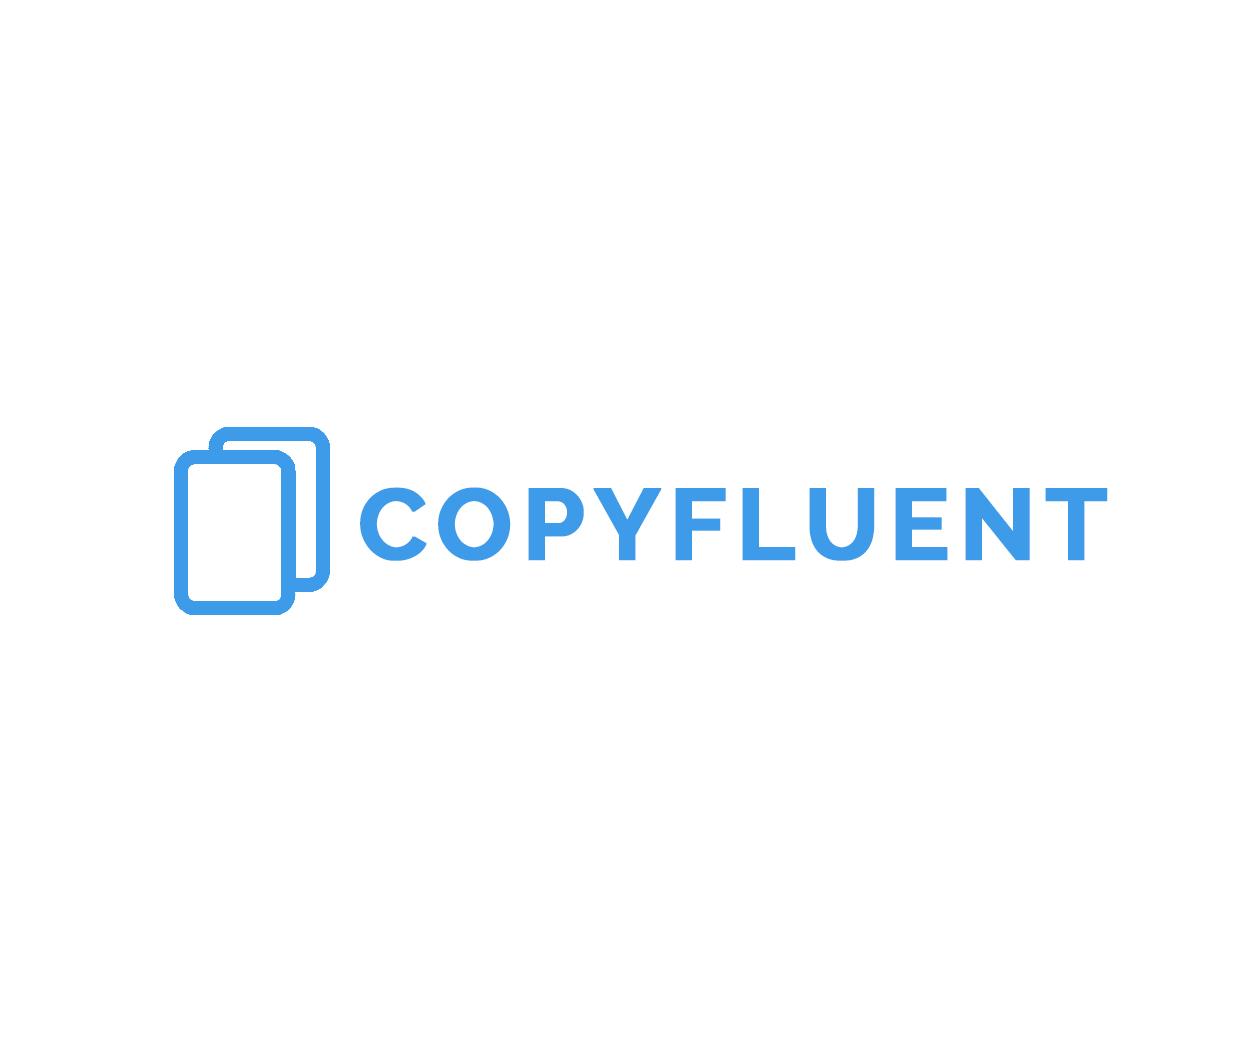 Copyfluent White Logo